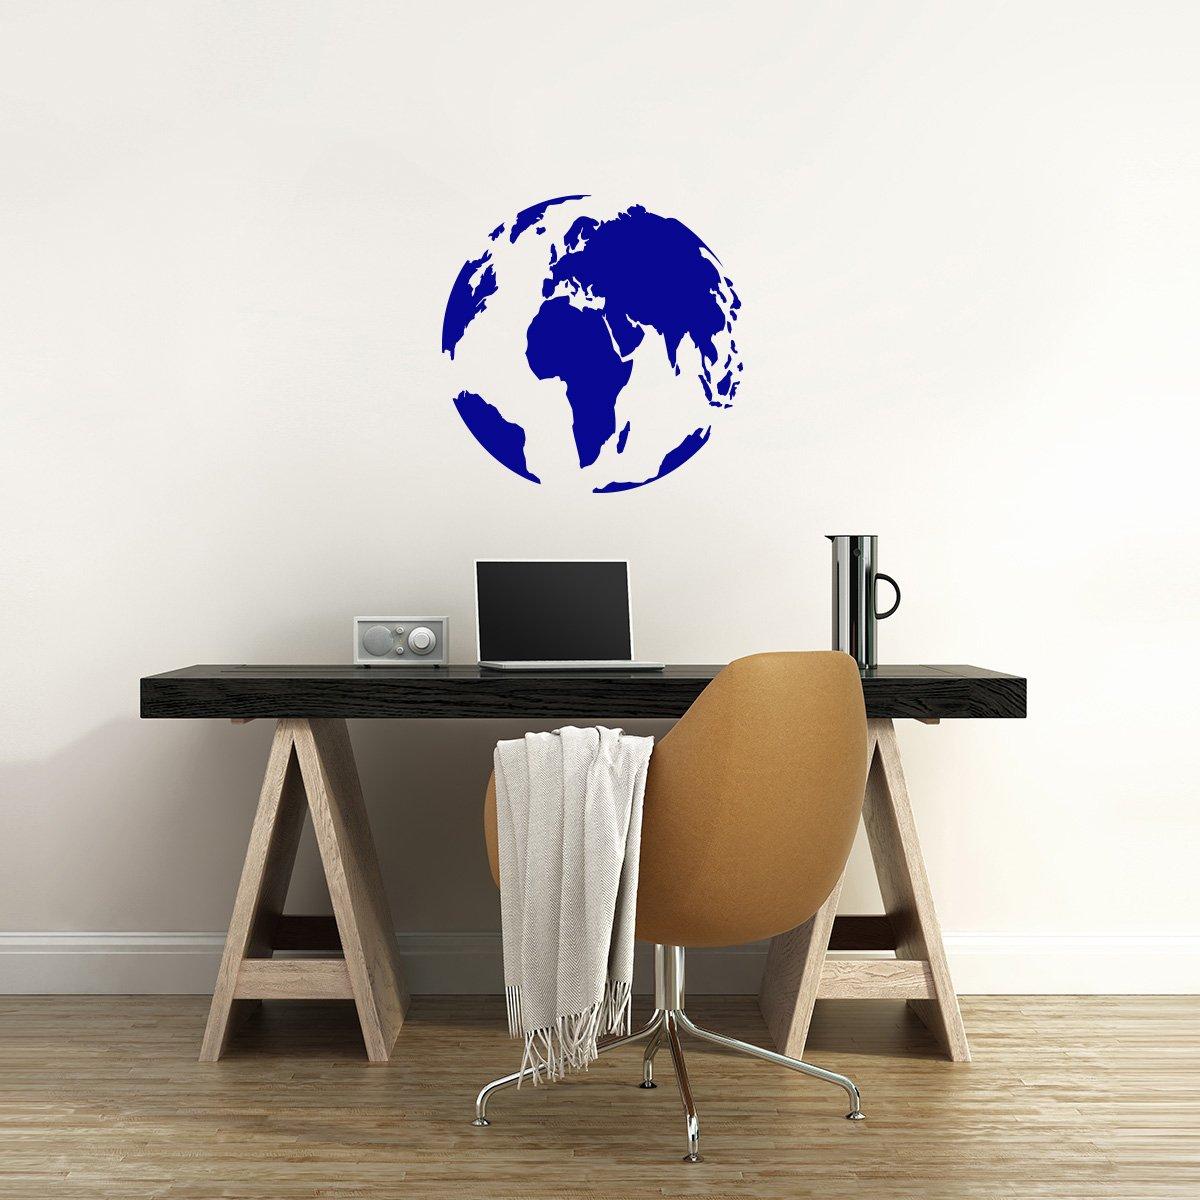 WANDKINGS Wandtattoo - Globus - 90 x 90 cm - - - Kupfer - Wähle aus 5 Größen & 35 Farben B078YCS8BF Wandtattoos & Wandbilder f0cc02